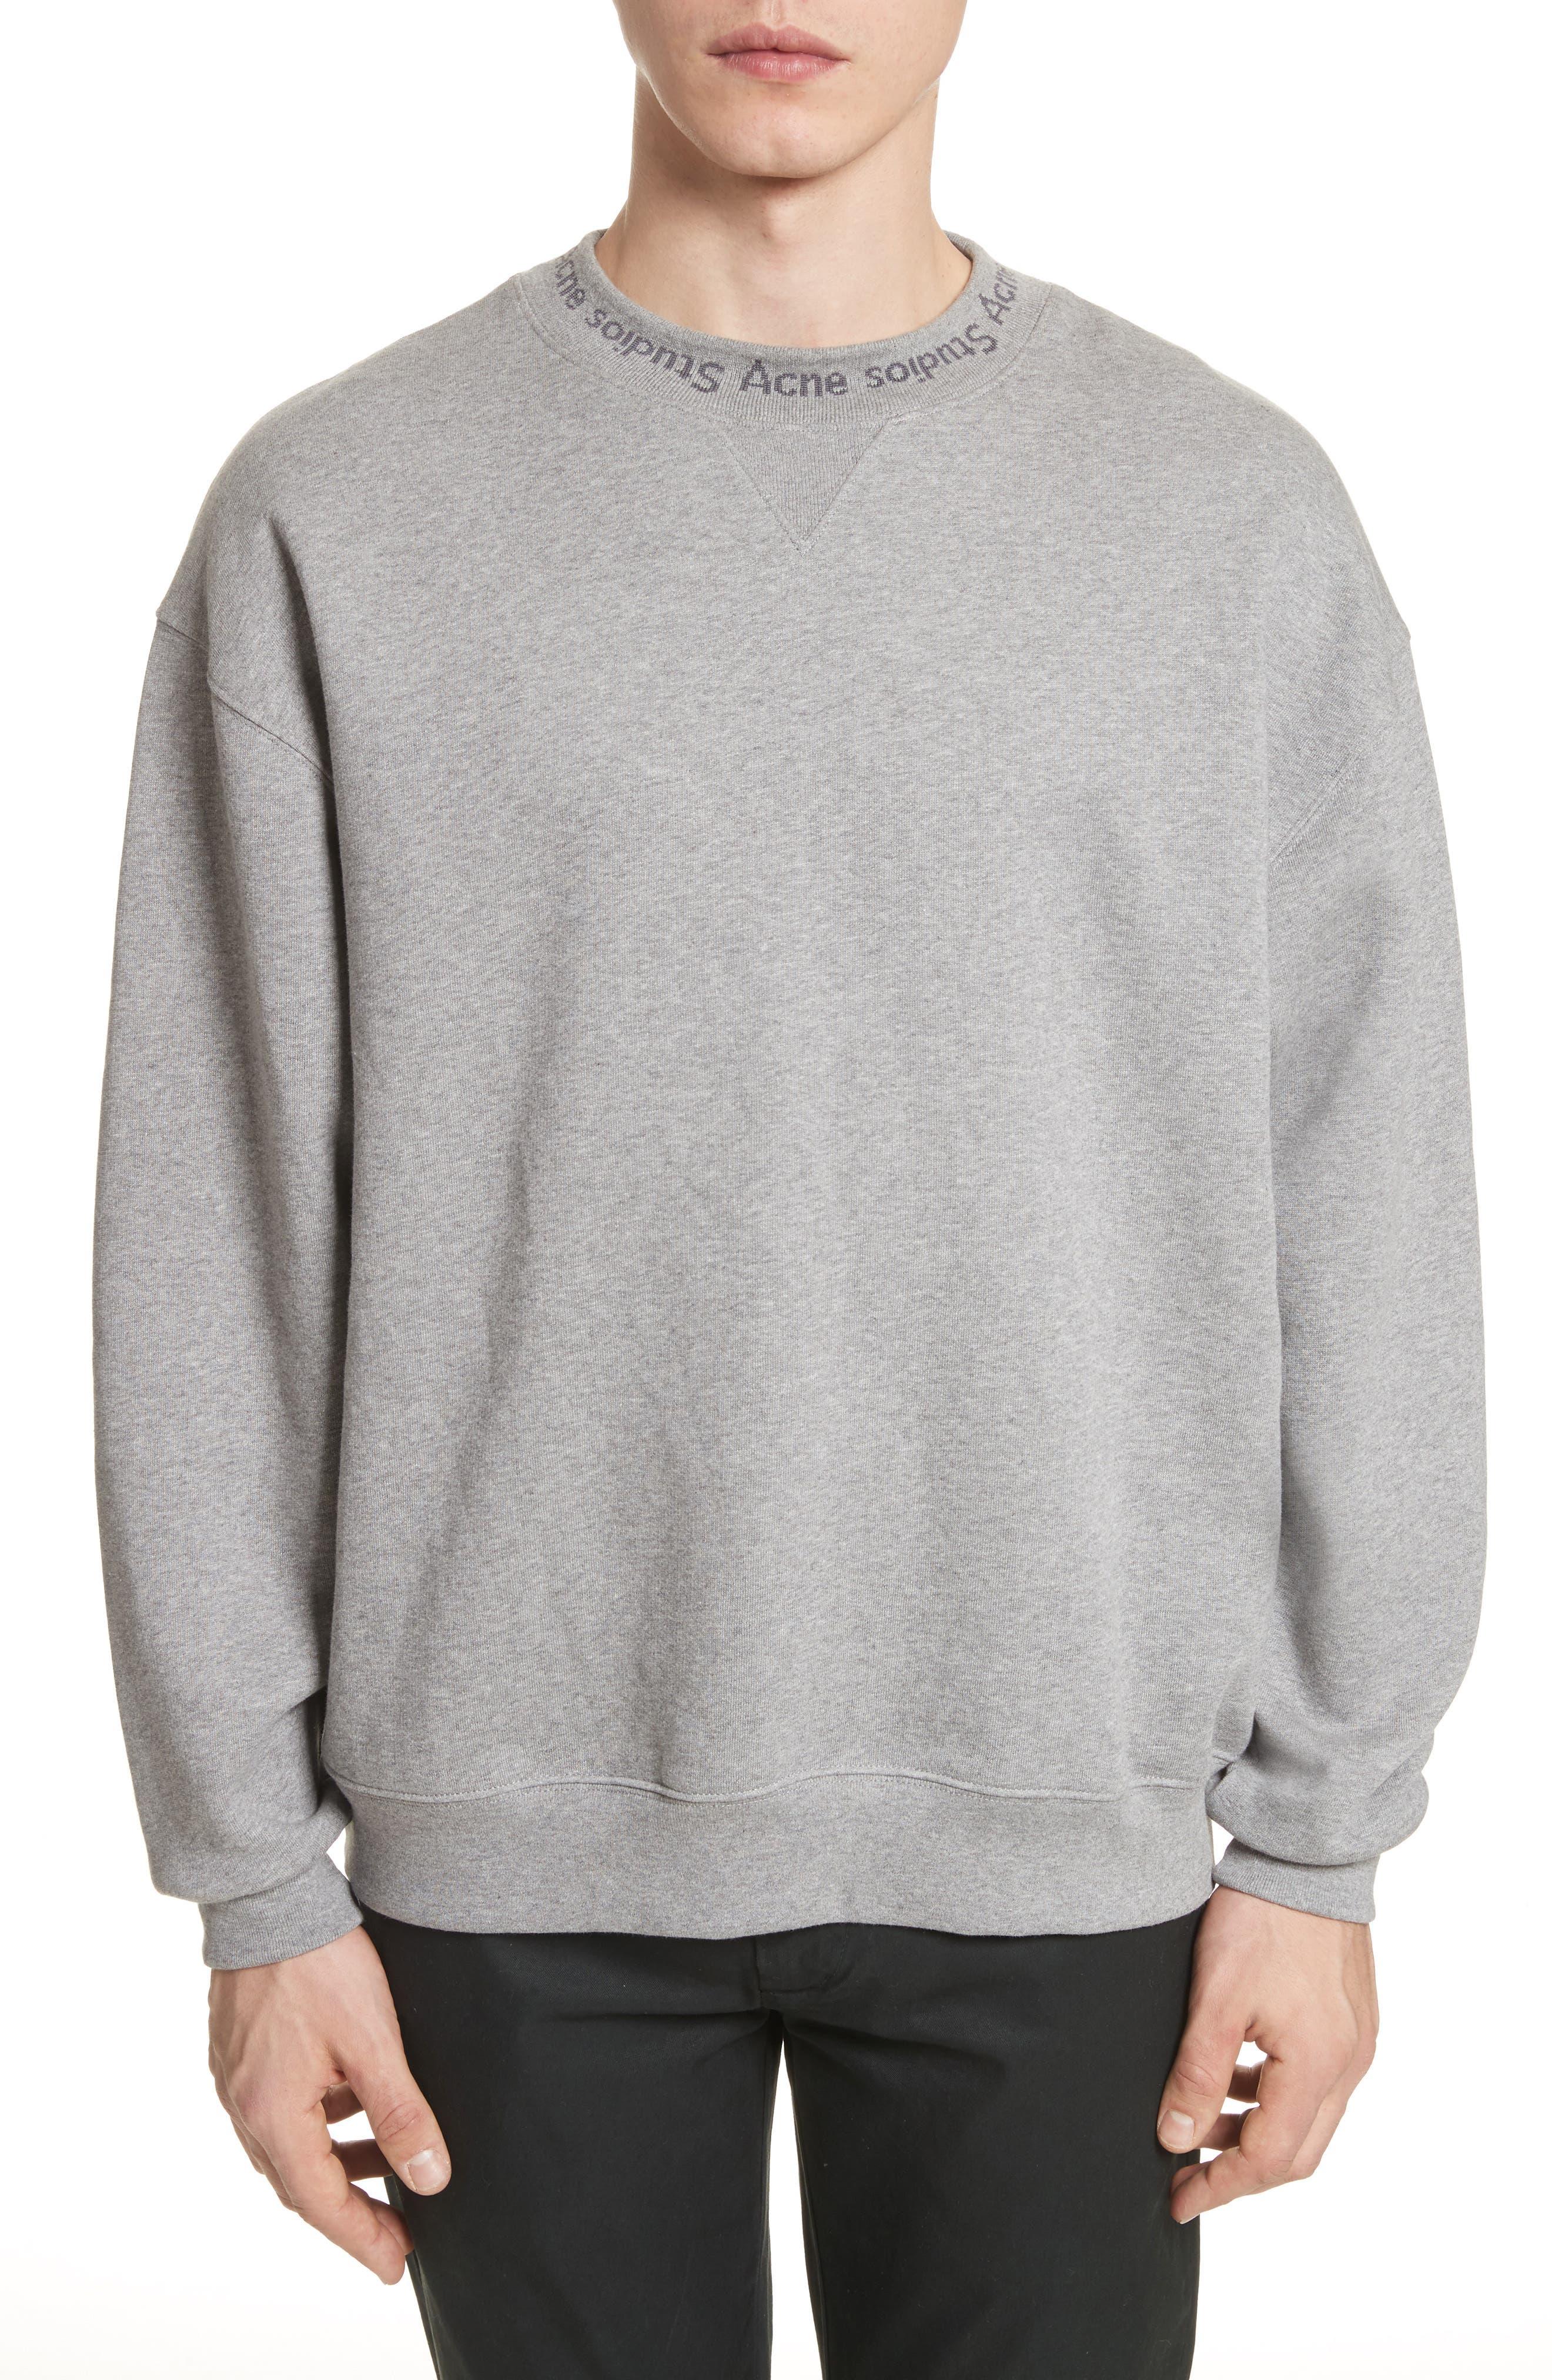 Flogo Oversize Cotton Sweatshirt,                         Main,                         color, LIGHT GREY MELANGE